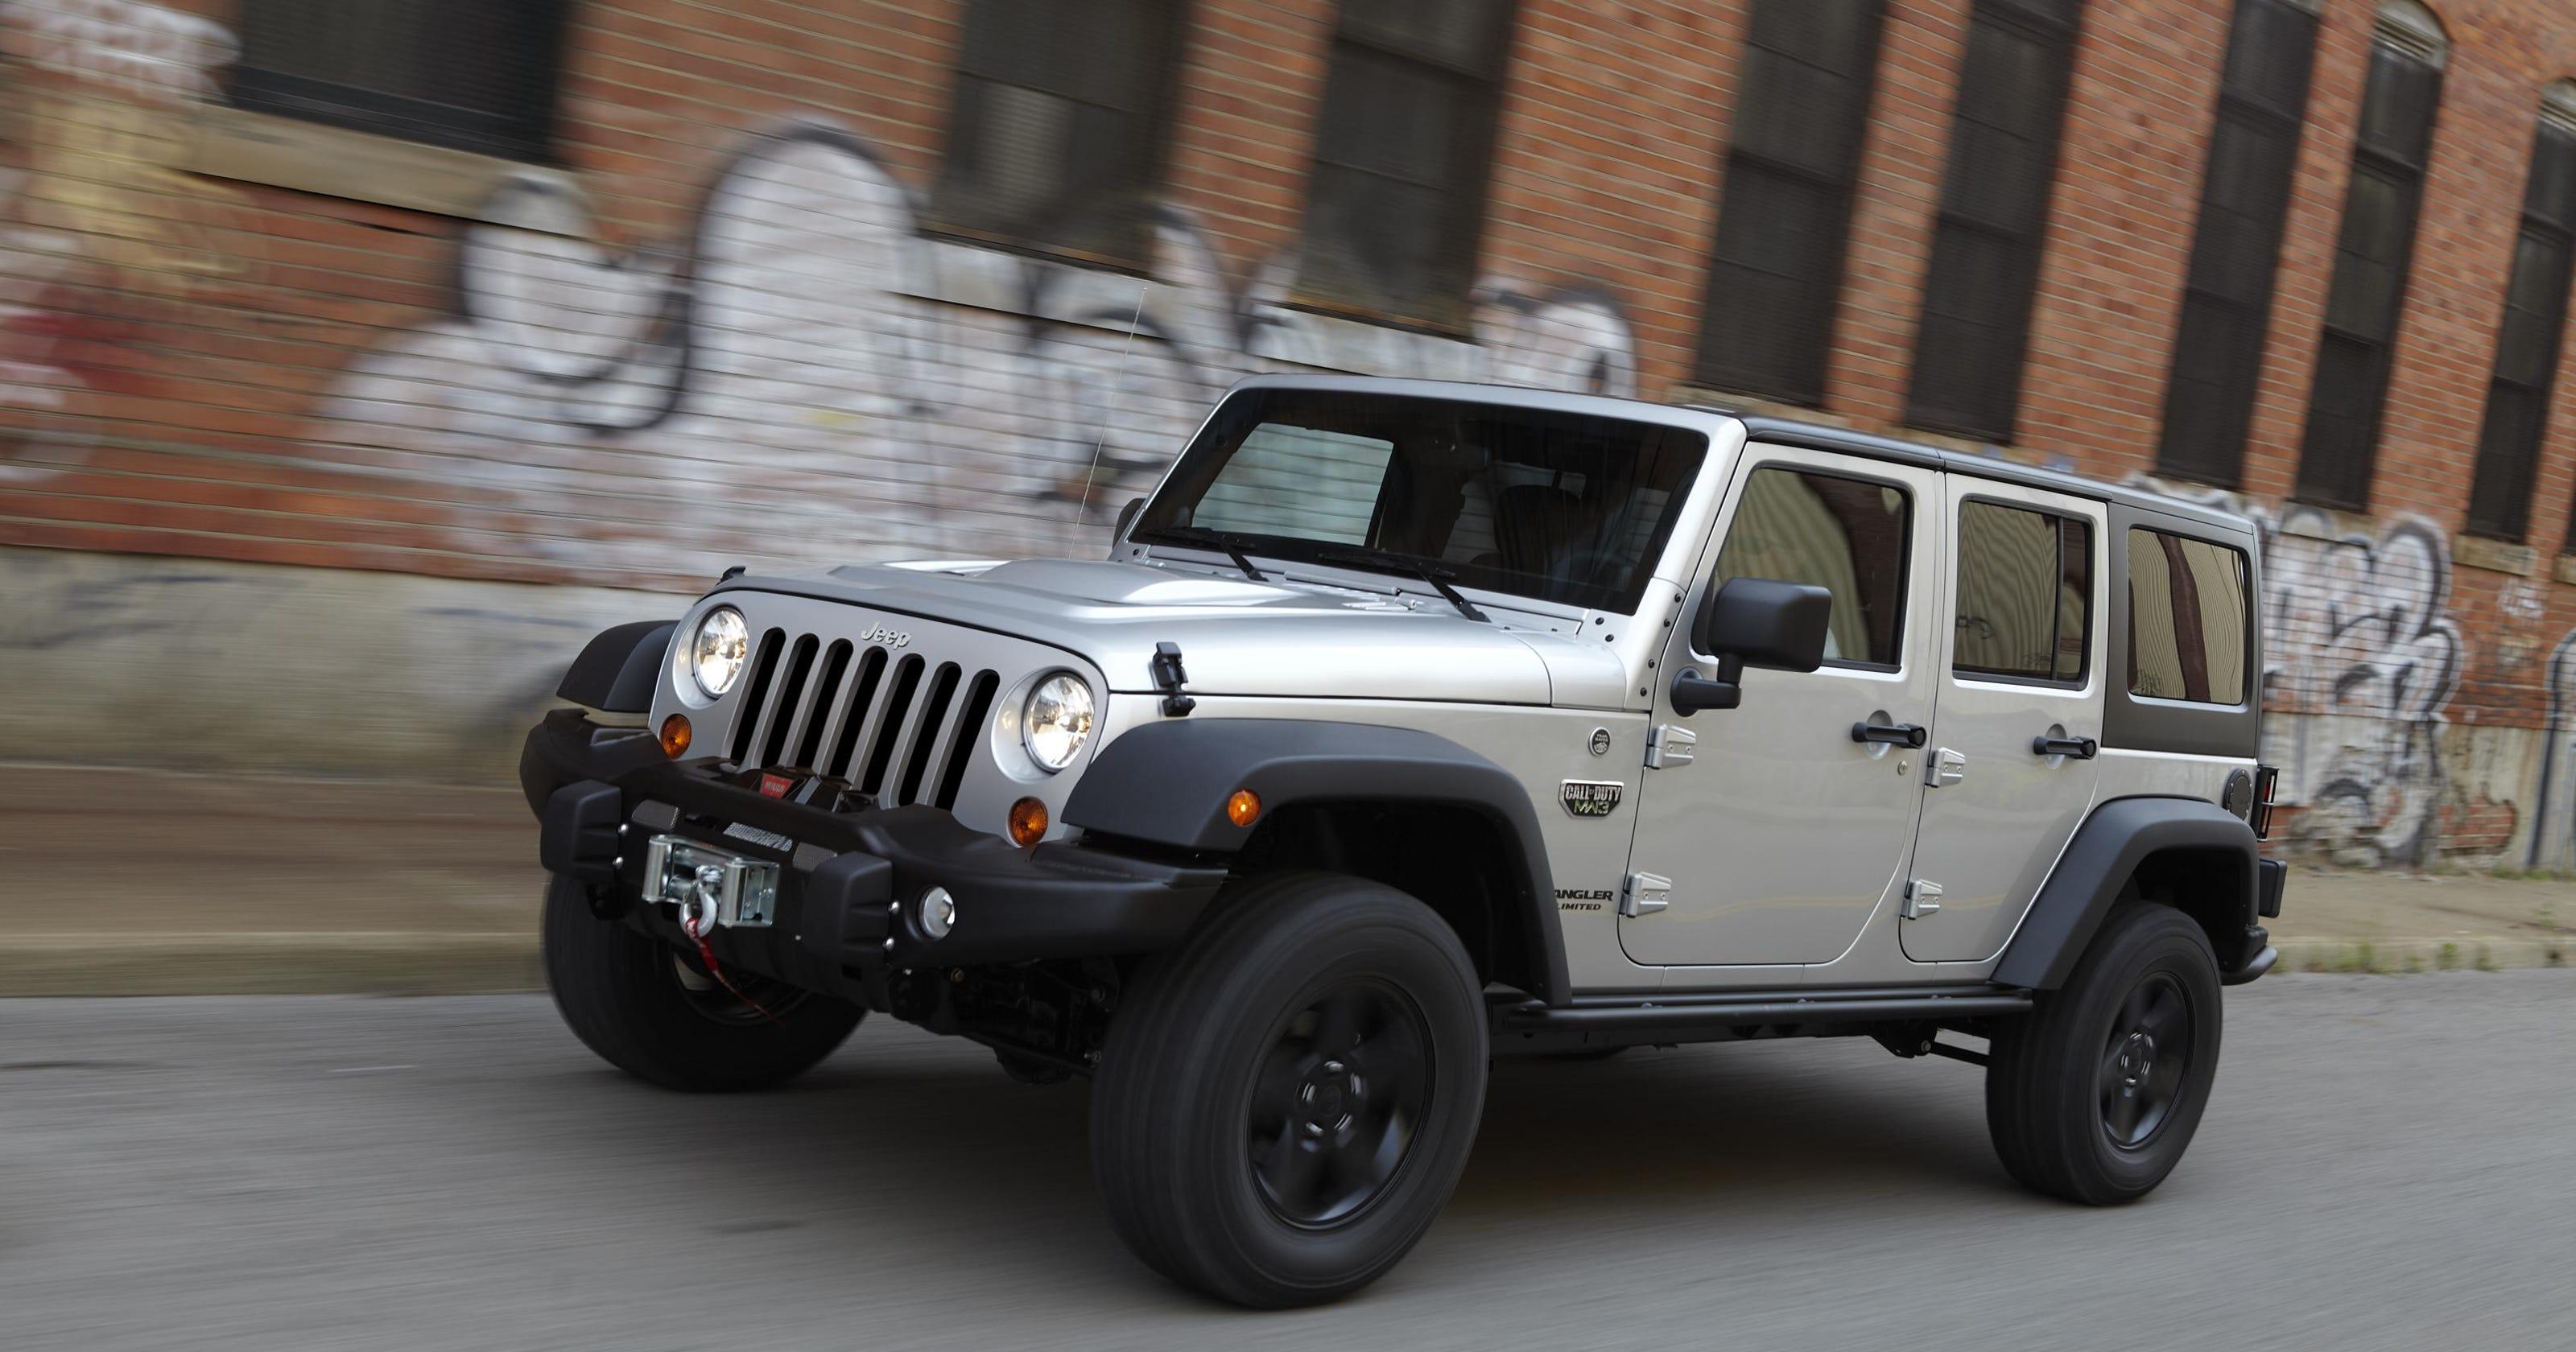 7e439b0d44b1 U.S. probes 630K Jeep Wrangler SUVs for air bag issue